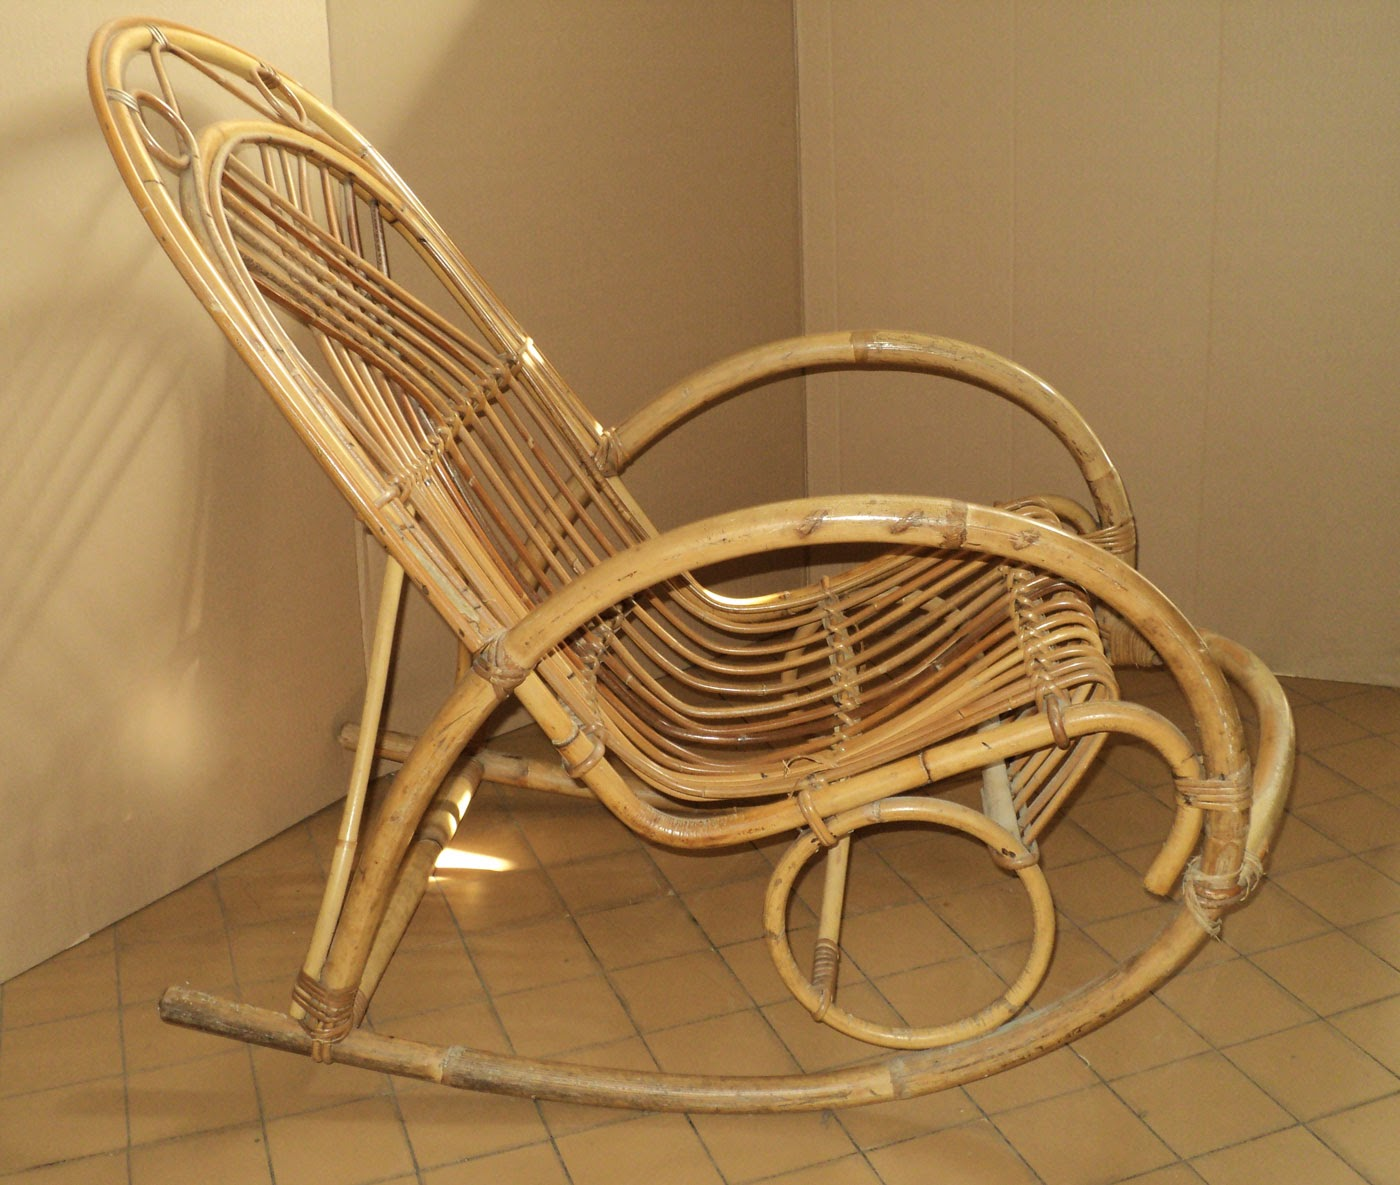 Piccola sedia a dondolo in bamb vintage small bamboo rocking chair ebay - Sedia a dondolo usata ...